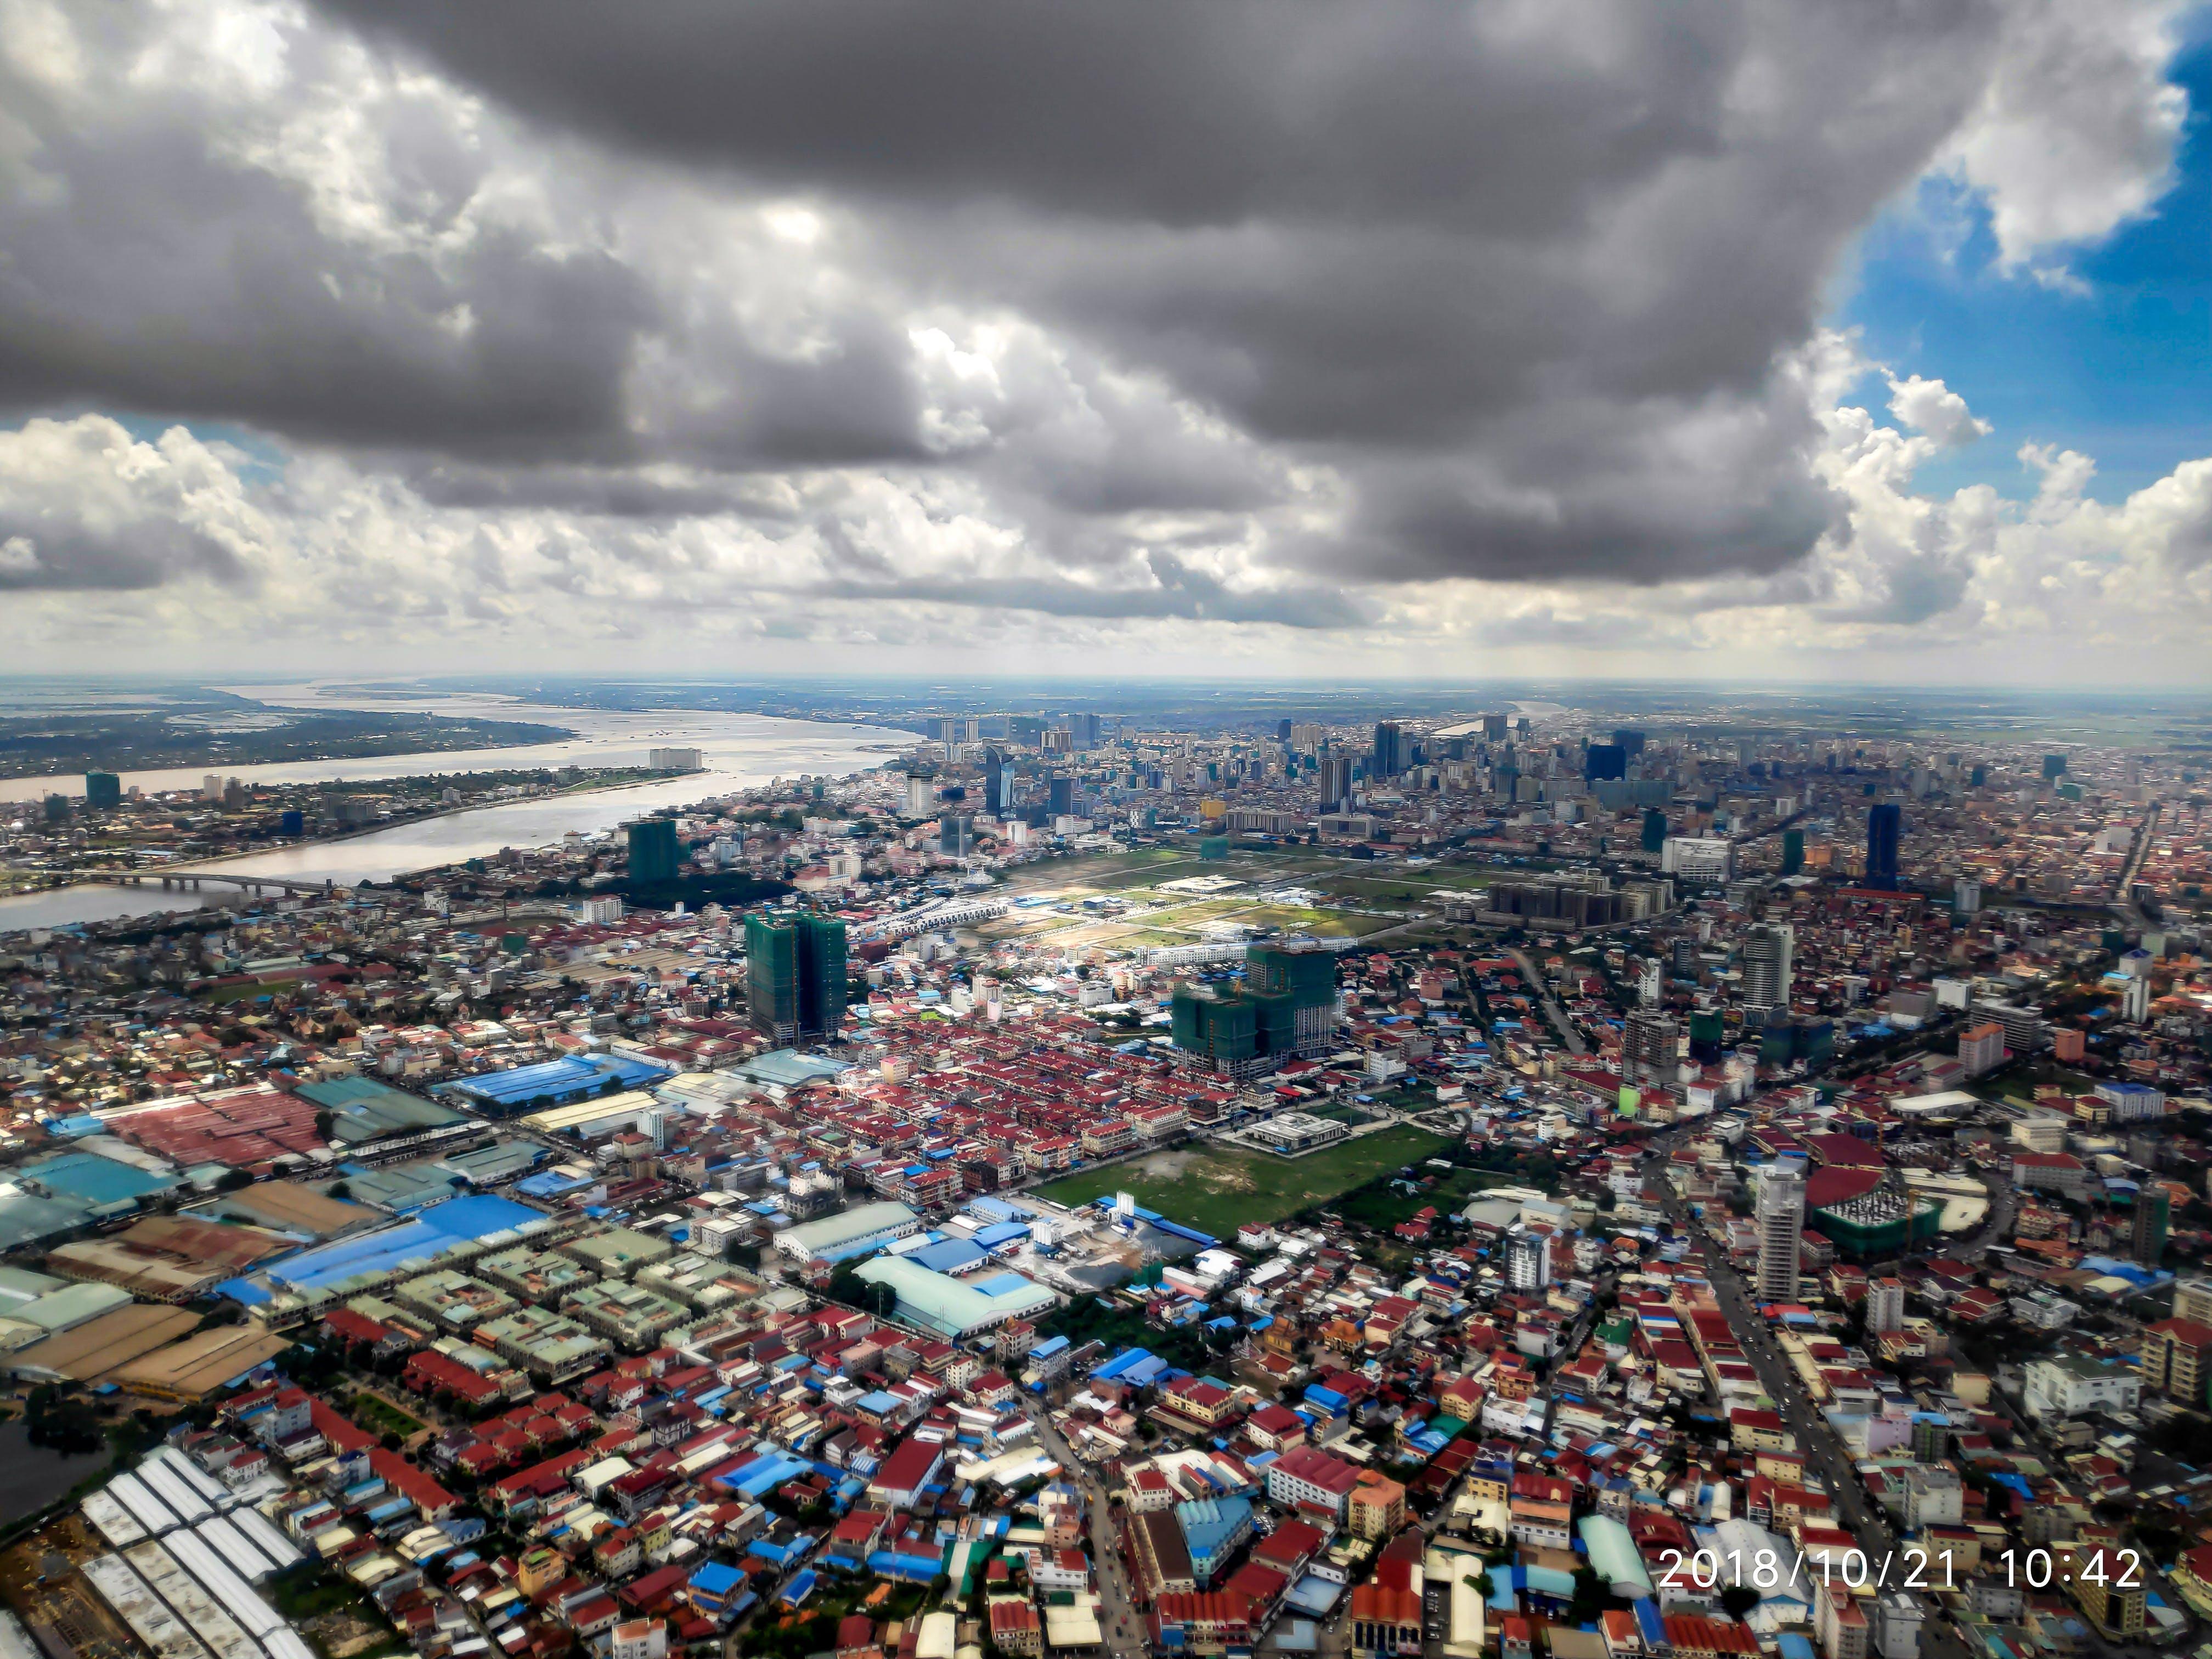 Free stock photo of Ariel view of Phnom Penh City, Mekang river